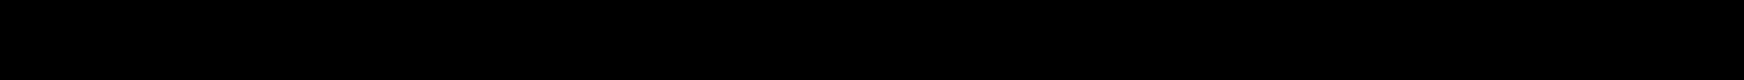 katsoulidis-bold-webfont.ttf